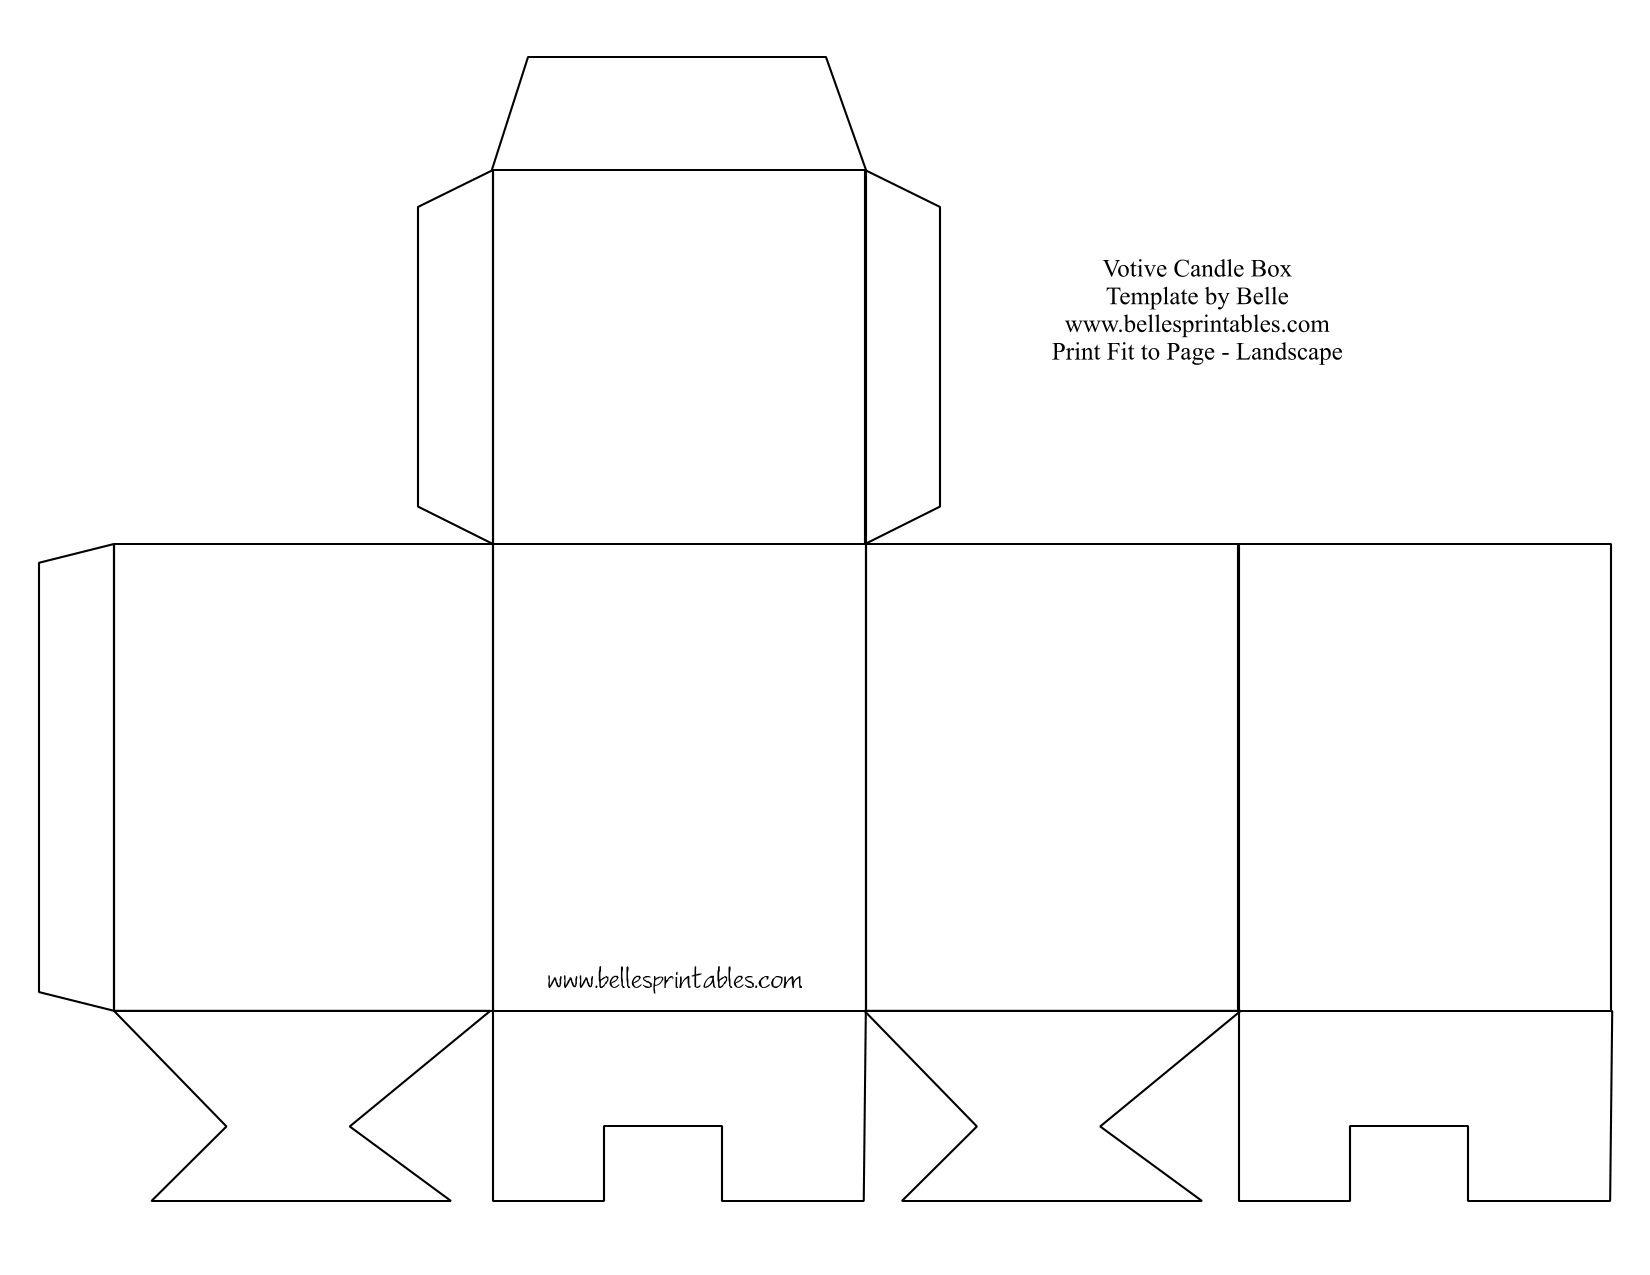 Printable Purse Template | Cute Paper Gift Box With Free Printable - Free Printable Box Patterns